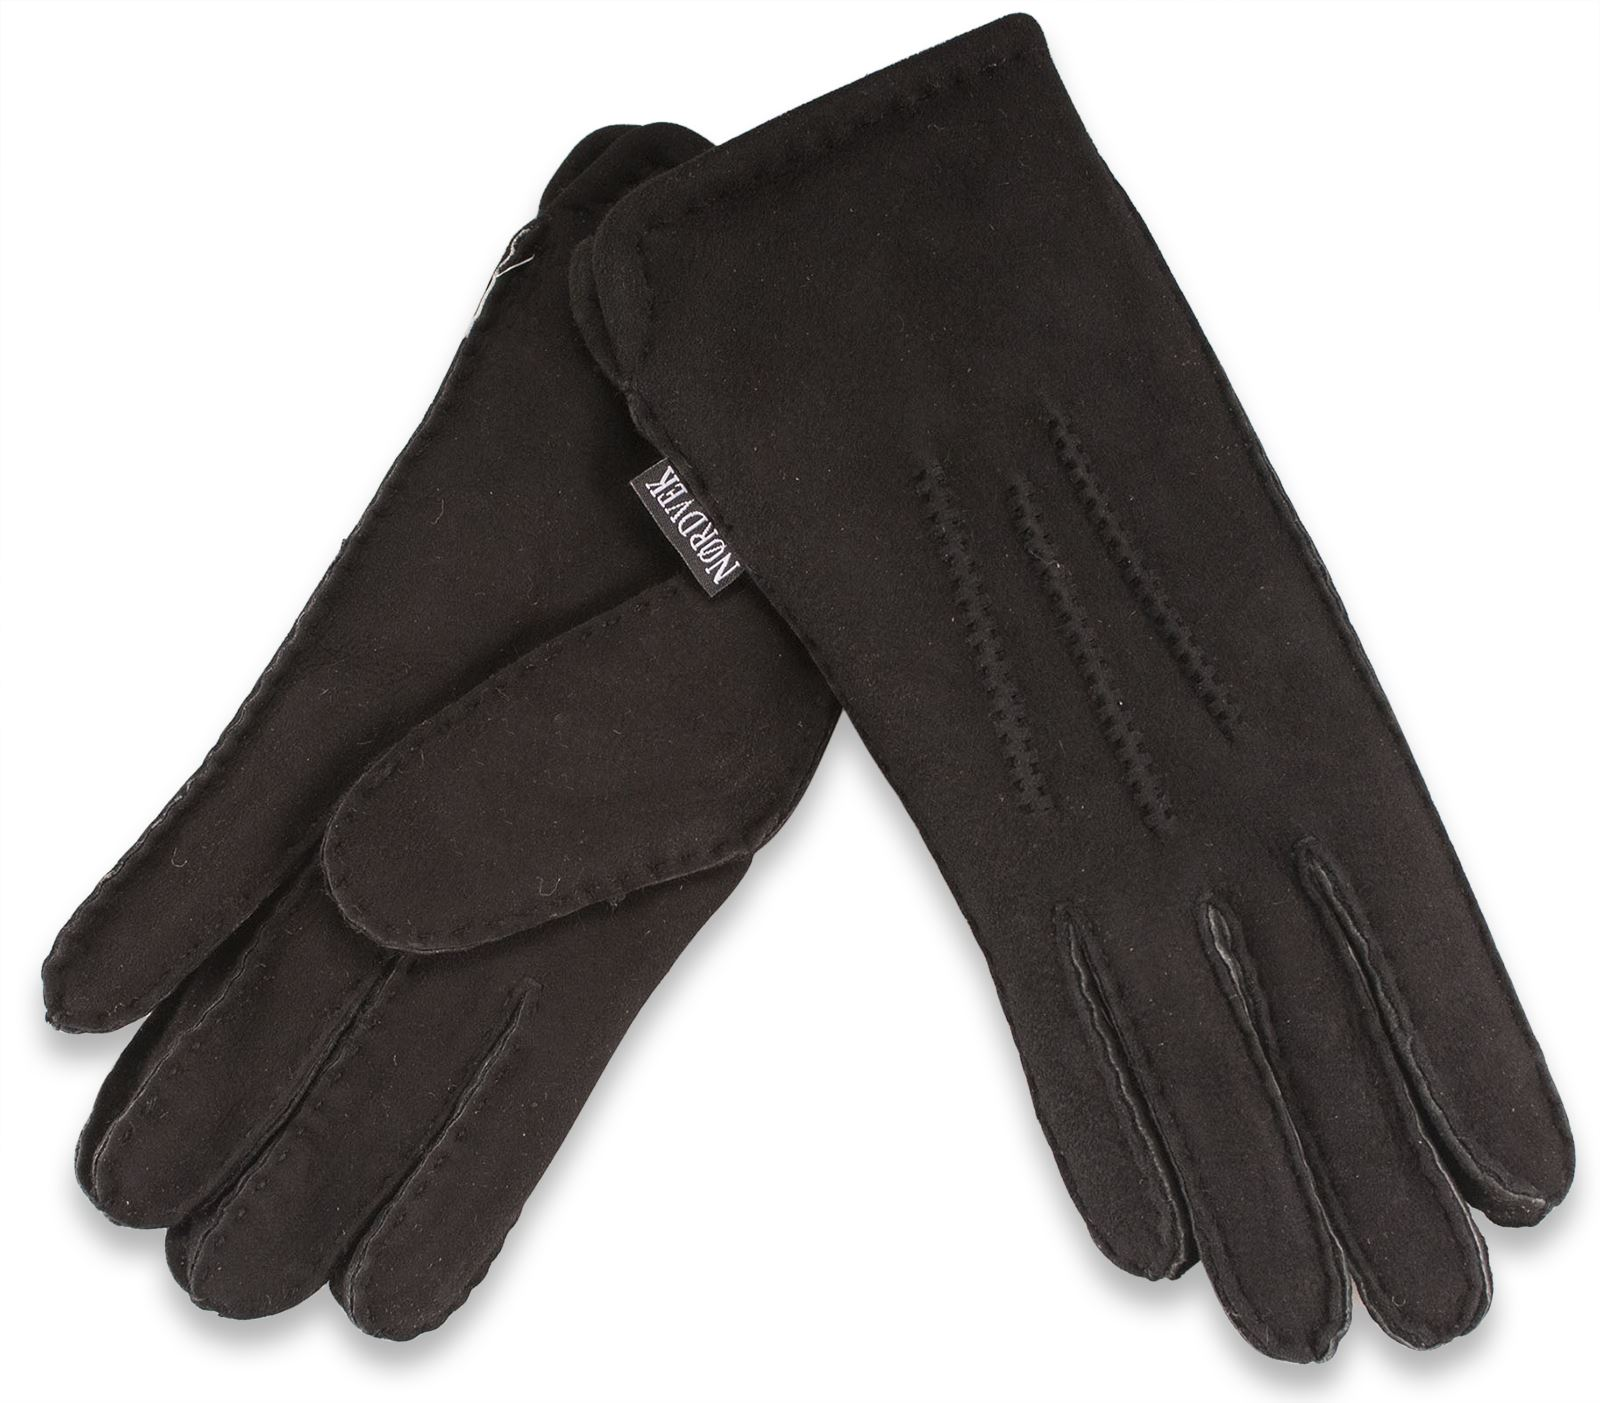 Mens sheepskin gloves uk - Nordvek Mens Premium Thick 100 Genuine Sheepskin Gloves